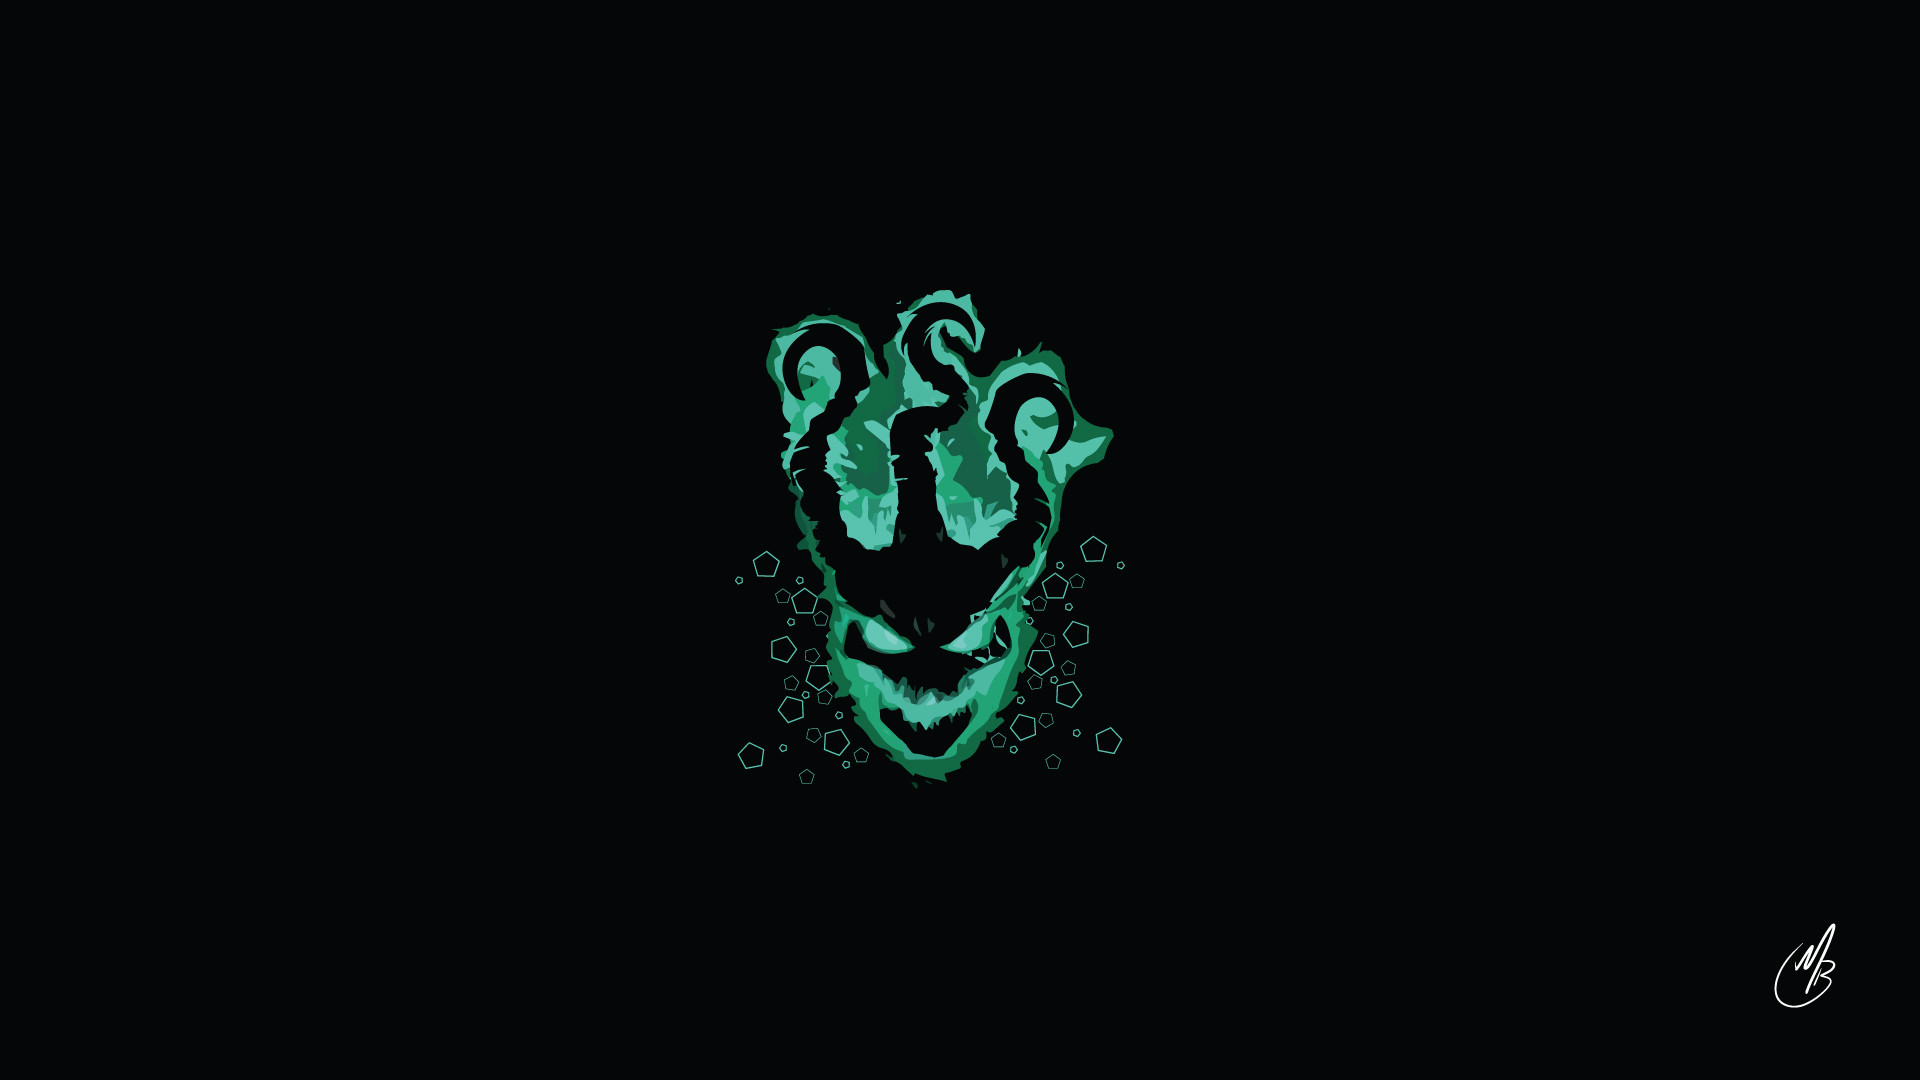 Sinister Thresh by Mburgess1 HD Wallpaper Fan Art Artwork League of Legends  lol